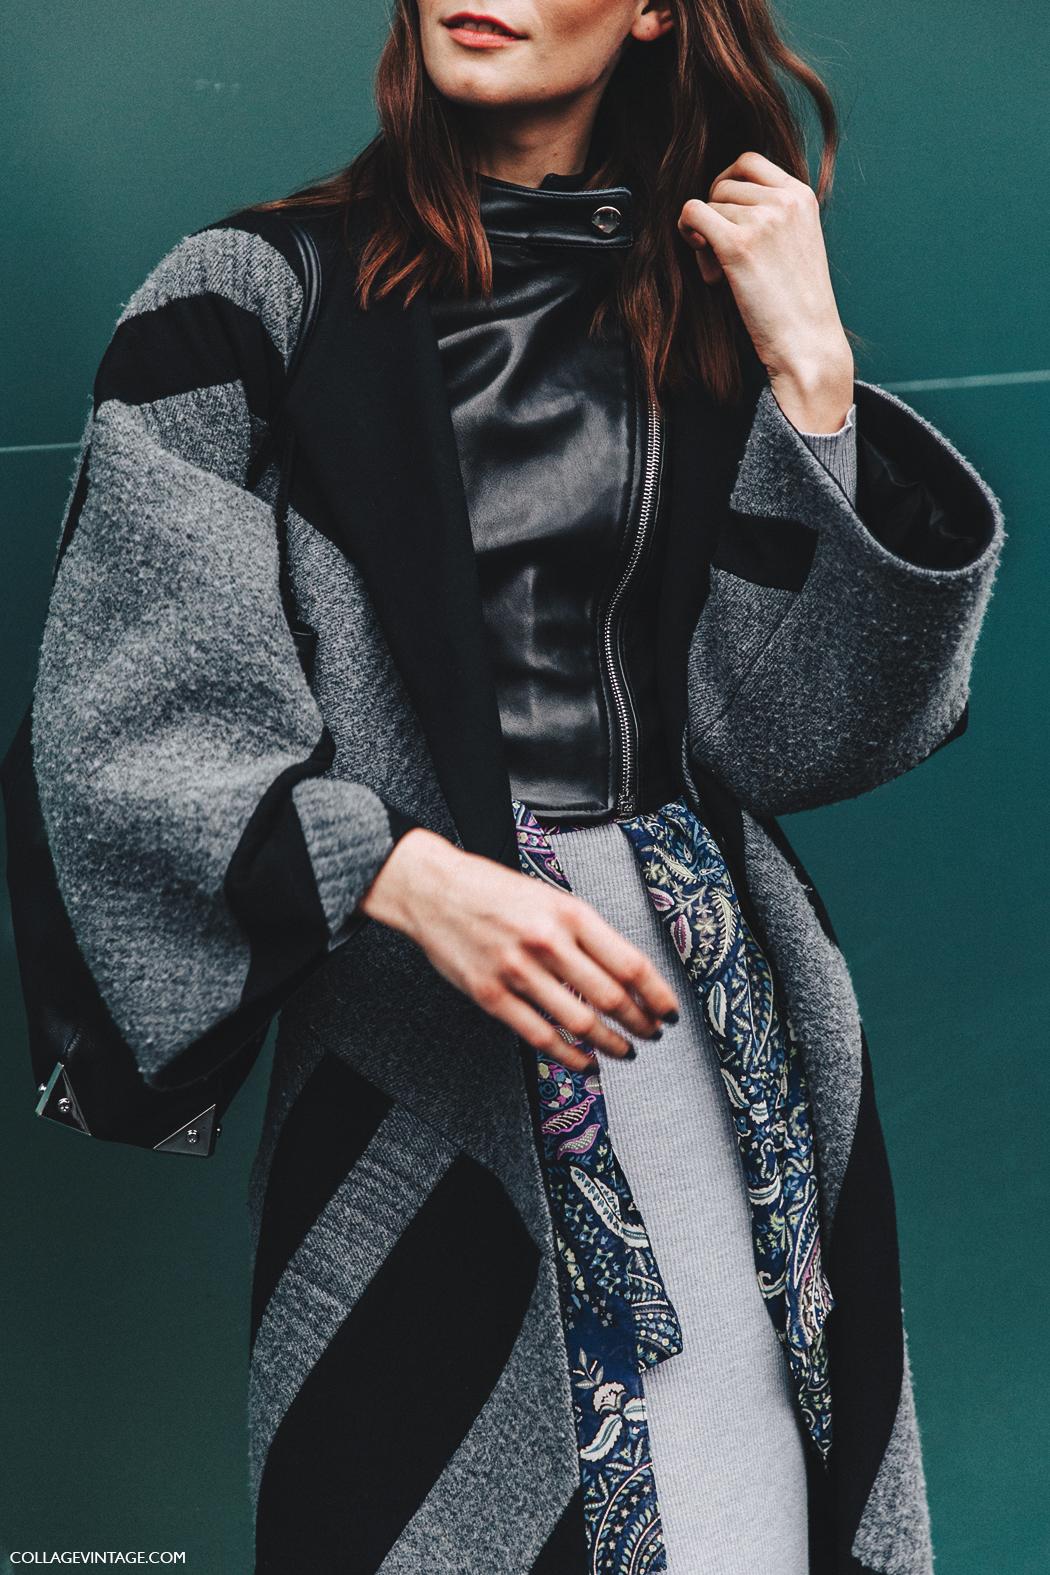 Milan_Fashion_Week_Fall_16-MFW-Street_Style-Collage_Vintage-Model-Midi_Skirt-Layers-Biker_Jacket-7